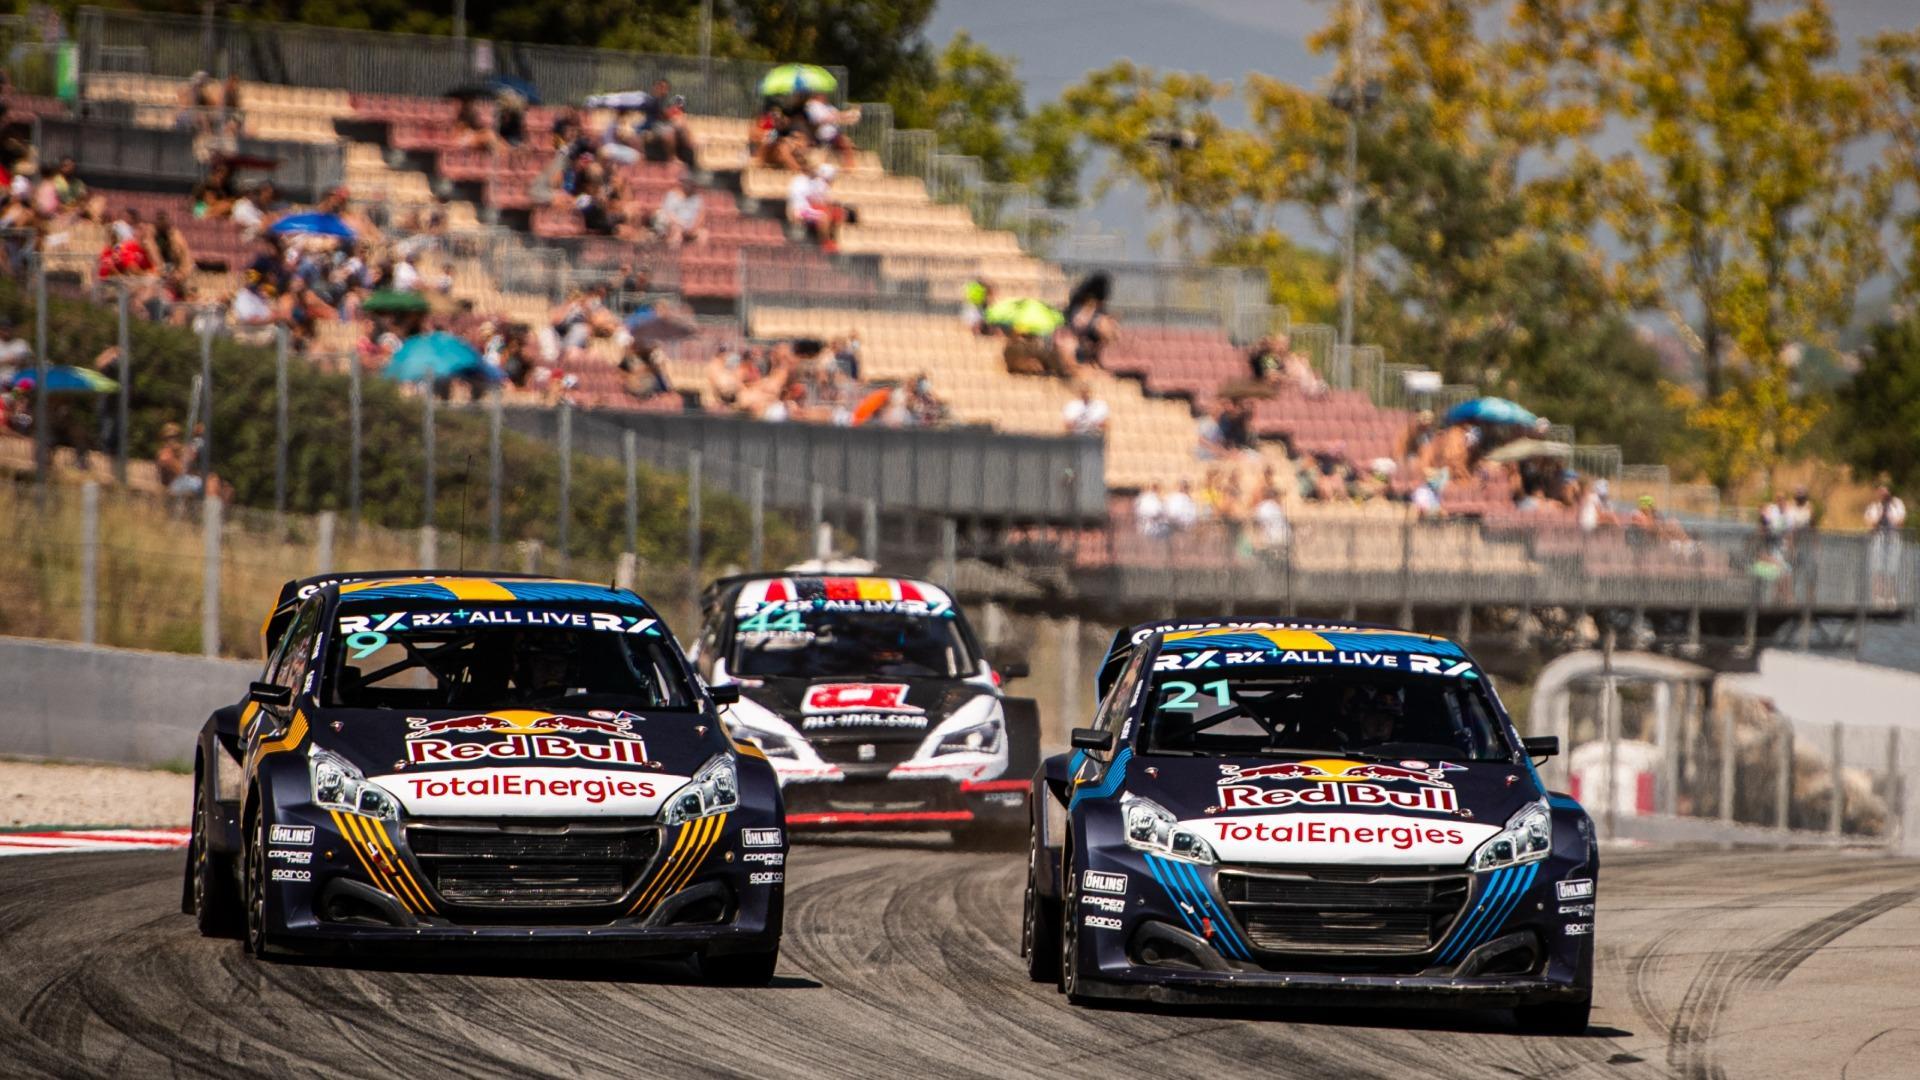 World RX of Catalunya 2021: Event Highlights